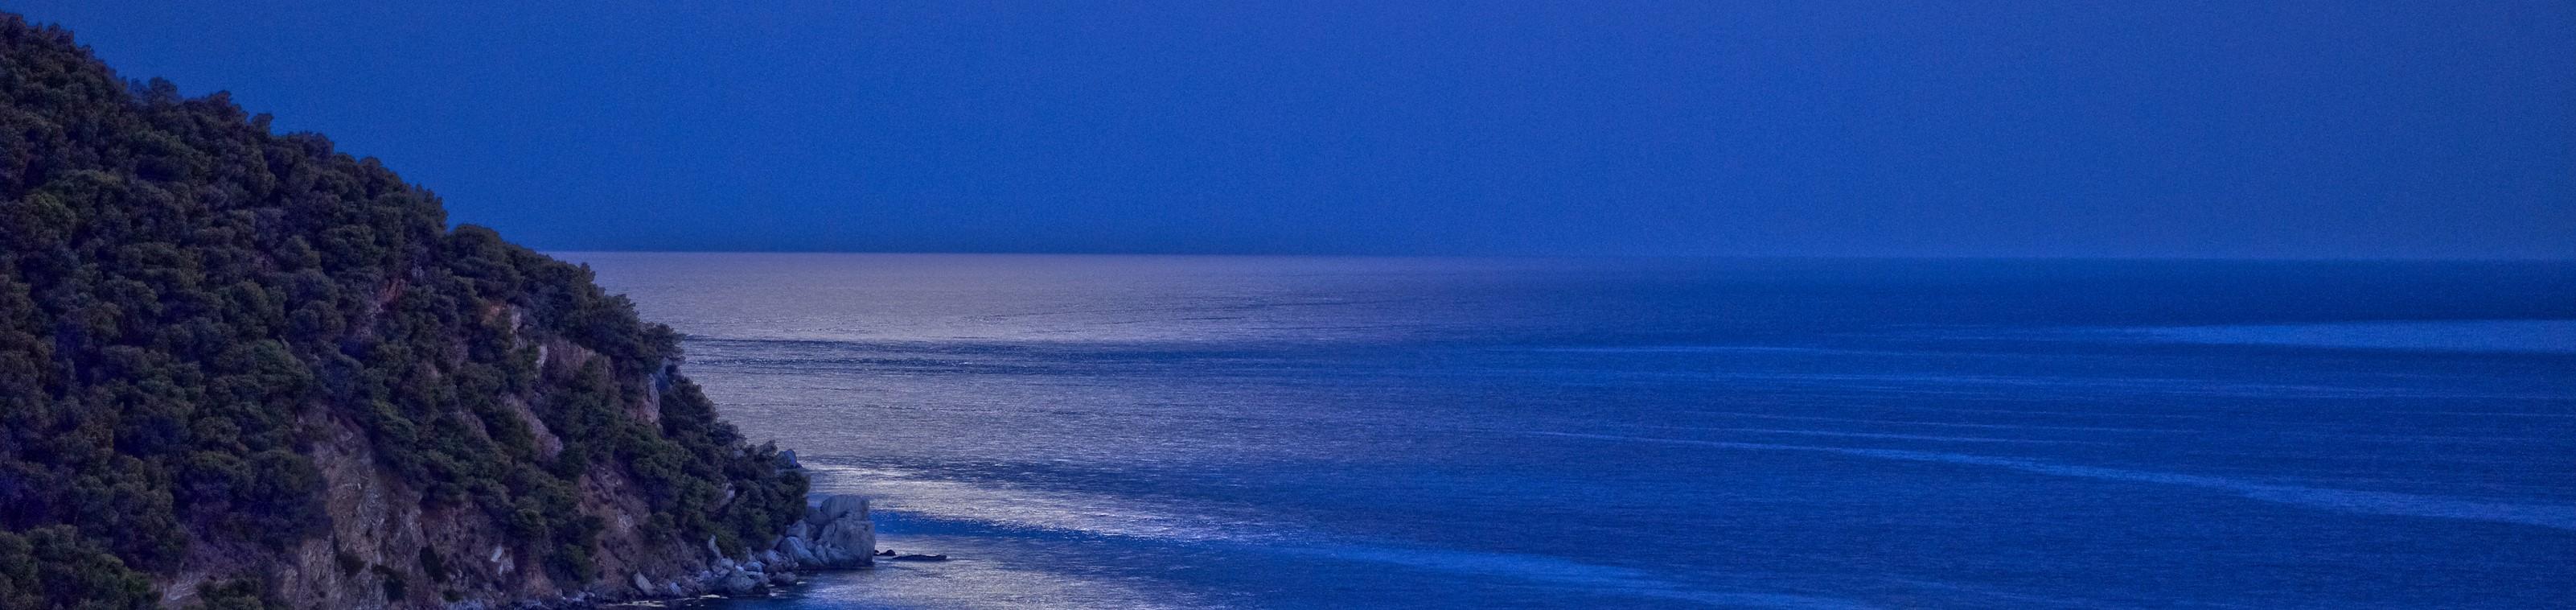 Viersterrenhotel Sirene Blue op het Griekse eiland Poros